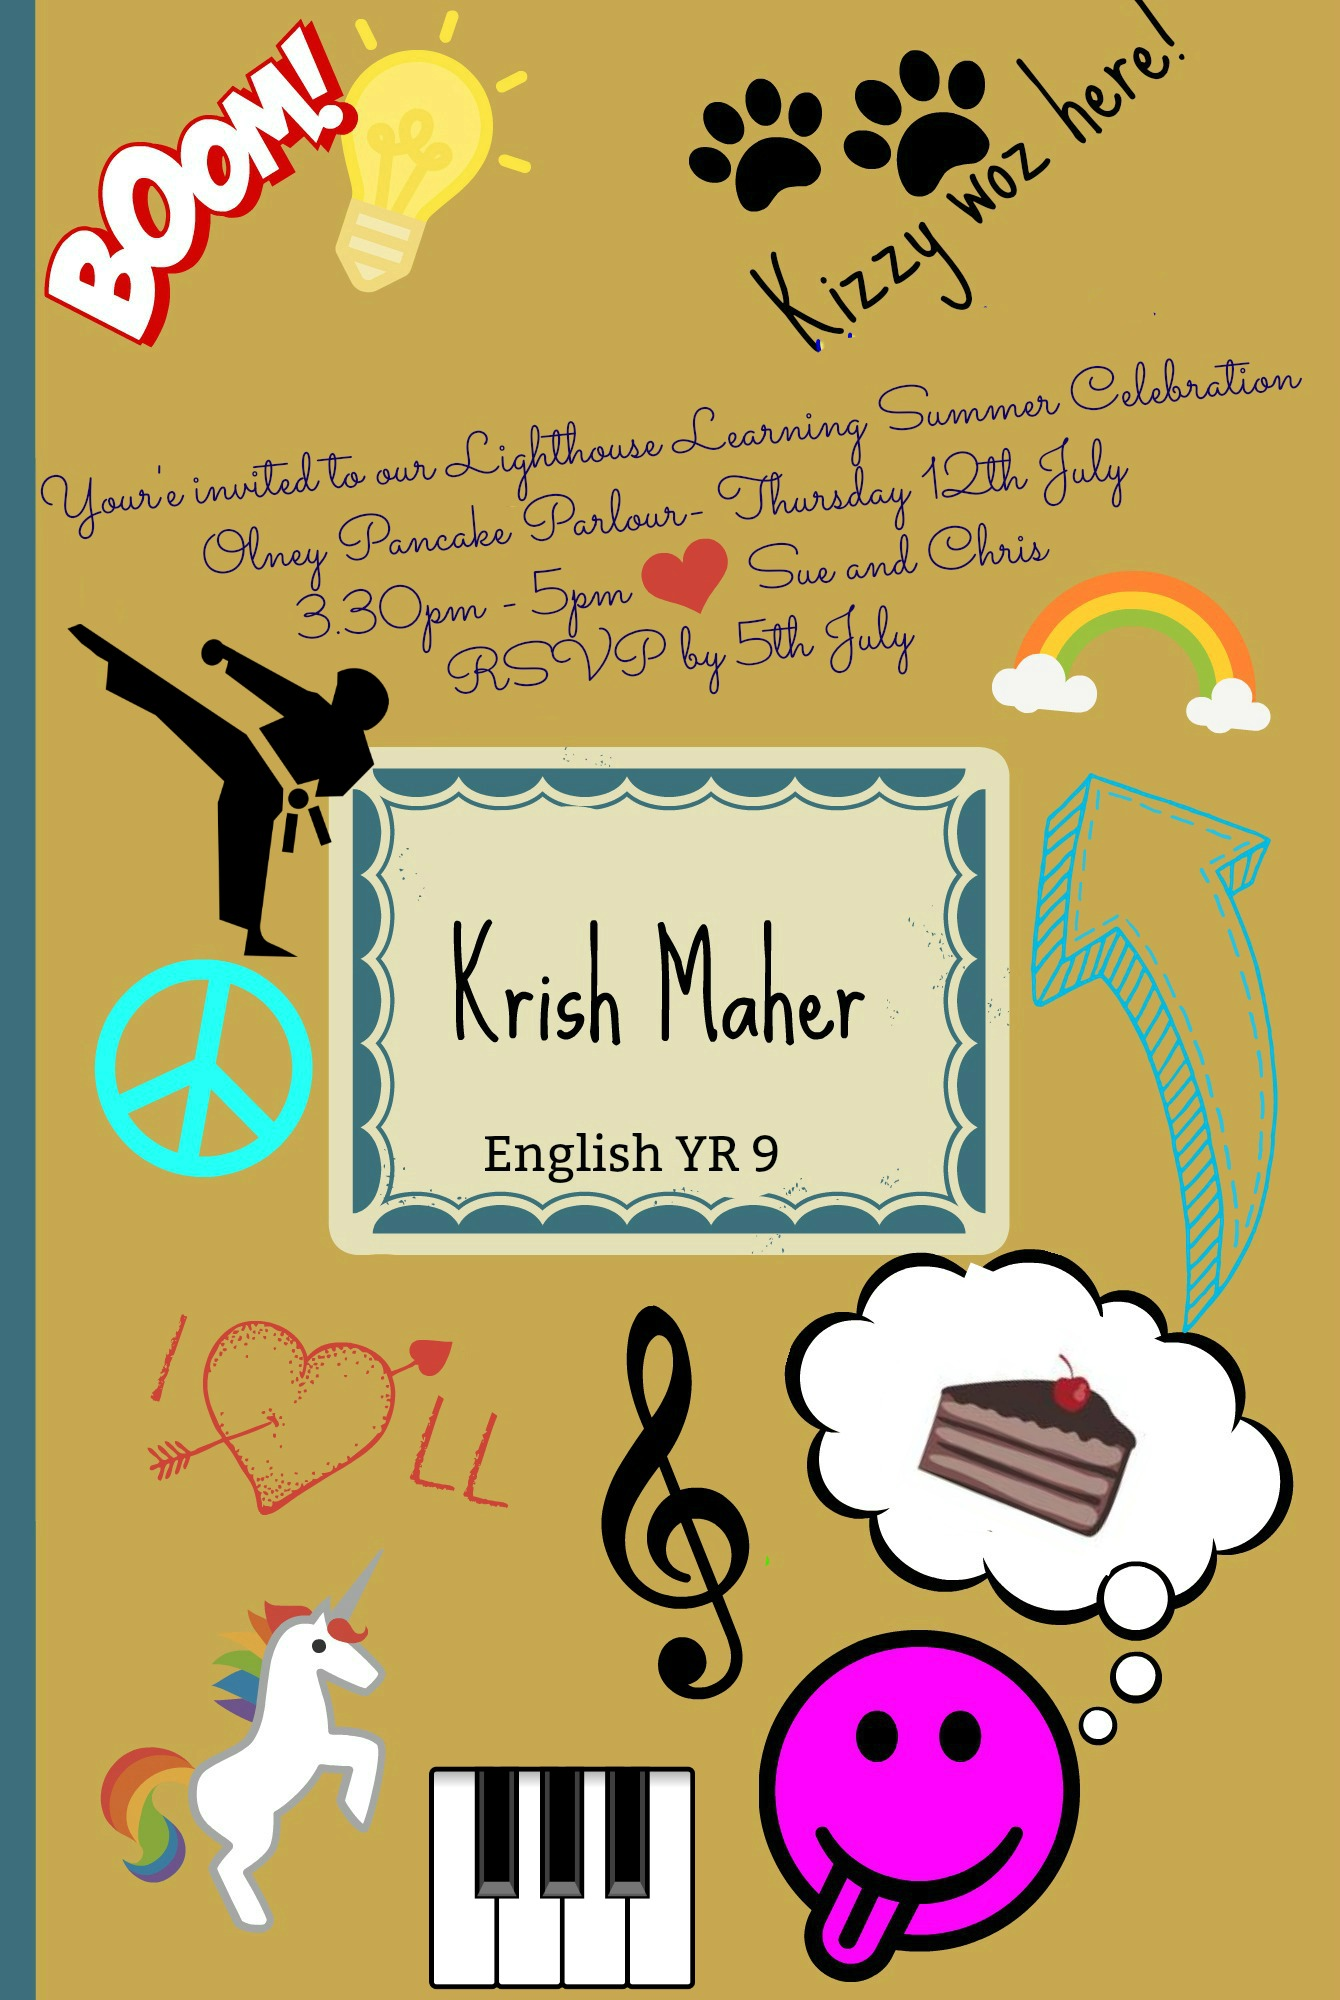 Invitation Krish